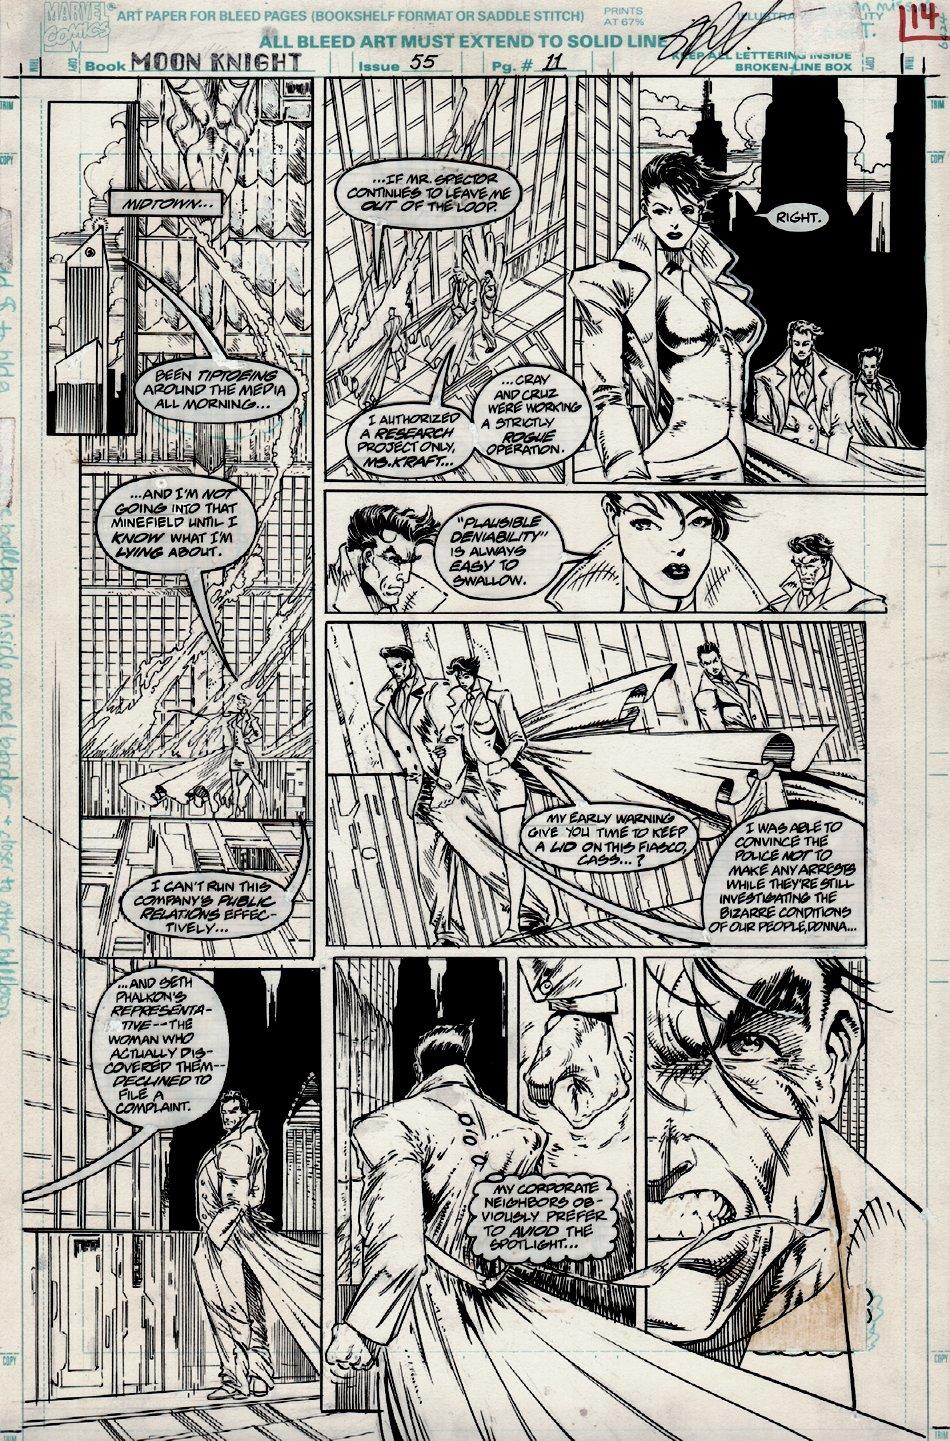 Moon Knight #55 p 11 (VERY FIRST STEPHEN PLATT ART!) 1993